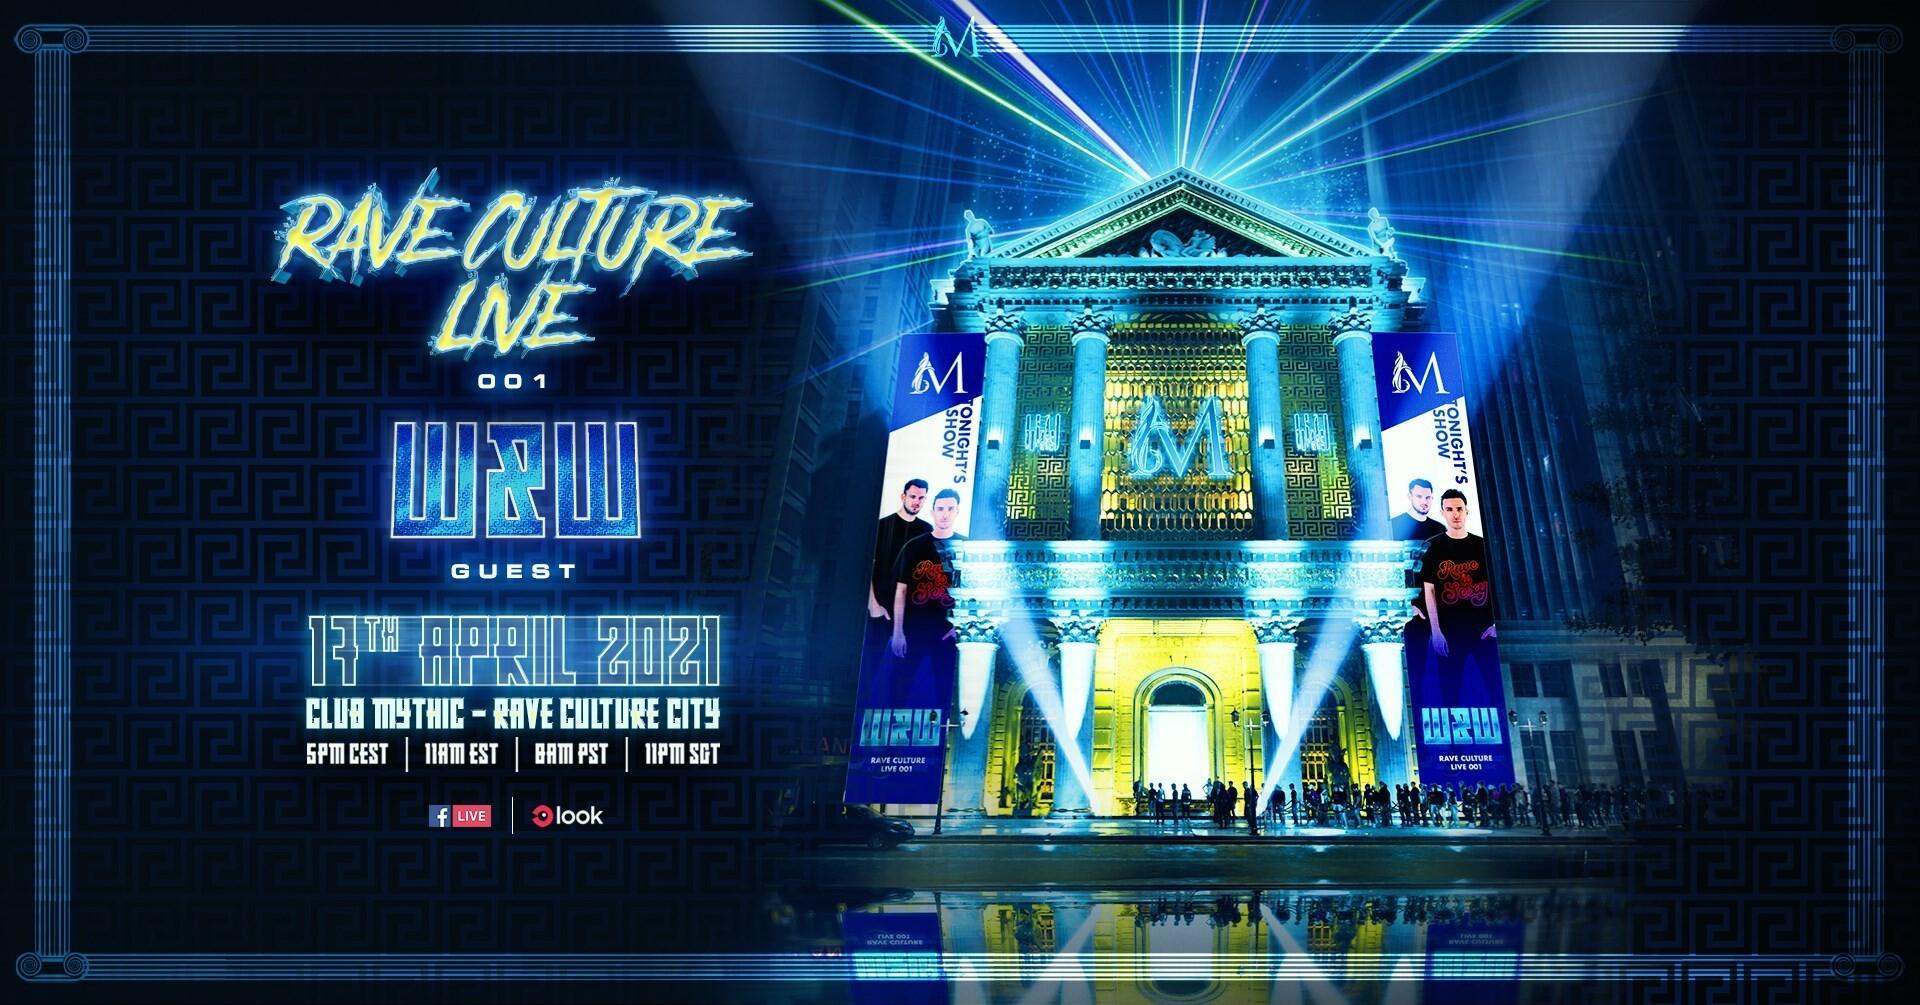 W&W(ダブリュー &ダブリュー)最新『Rave Culture』バーチャルライブを日本時間4月18日(日)0時より配信!!